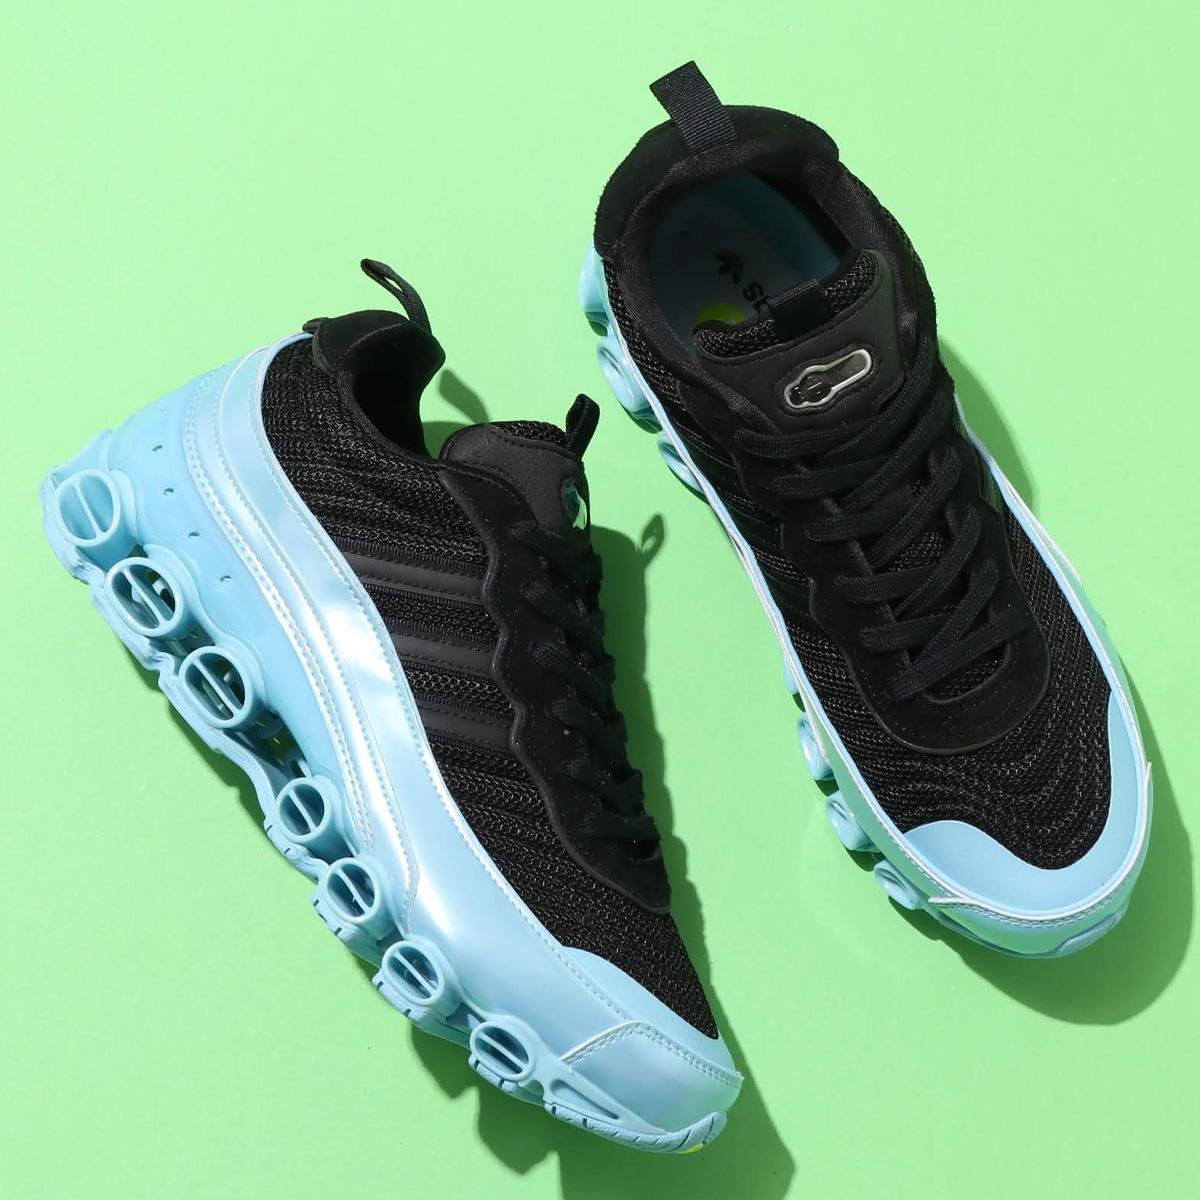 adidas MICROBOUNCE T1(アディダスマイクロバウンス T1)CORE BLACK/CORE BLACK/CLEAR BLUE【メンズ スニーカー】20SS-S